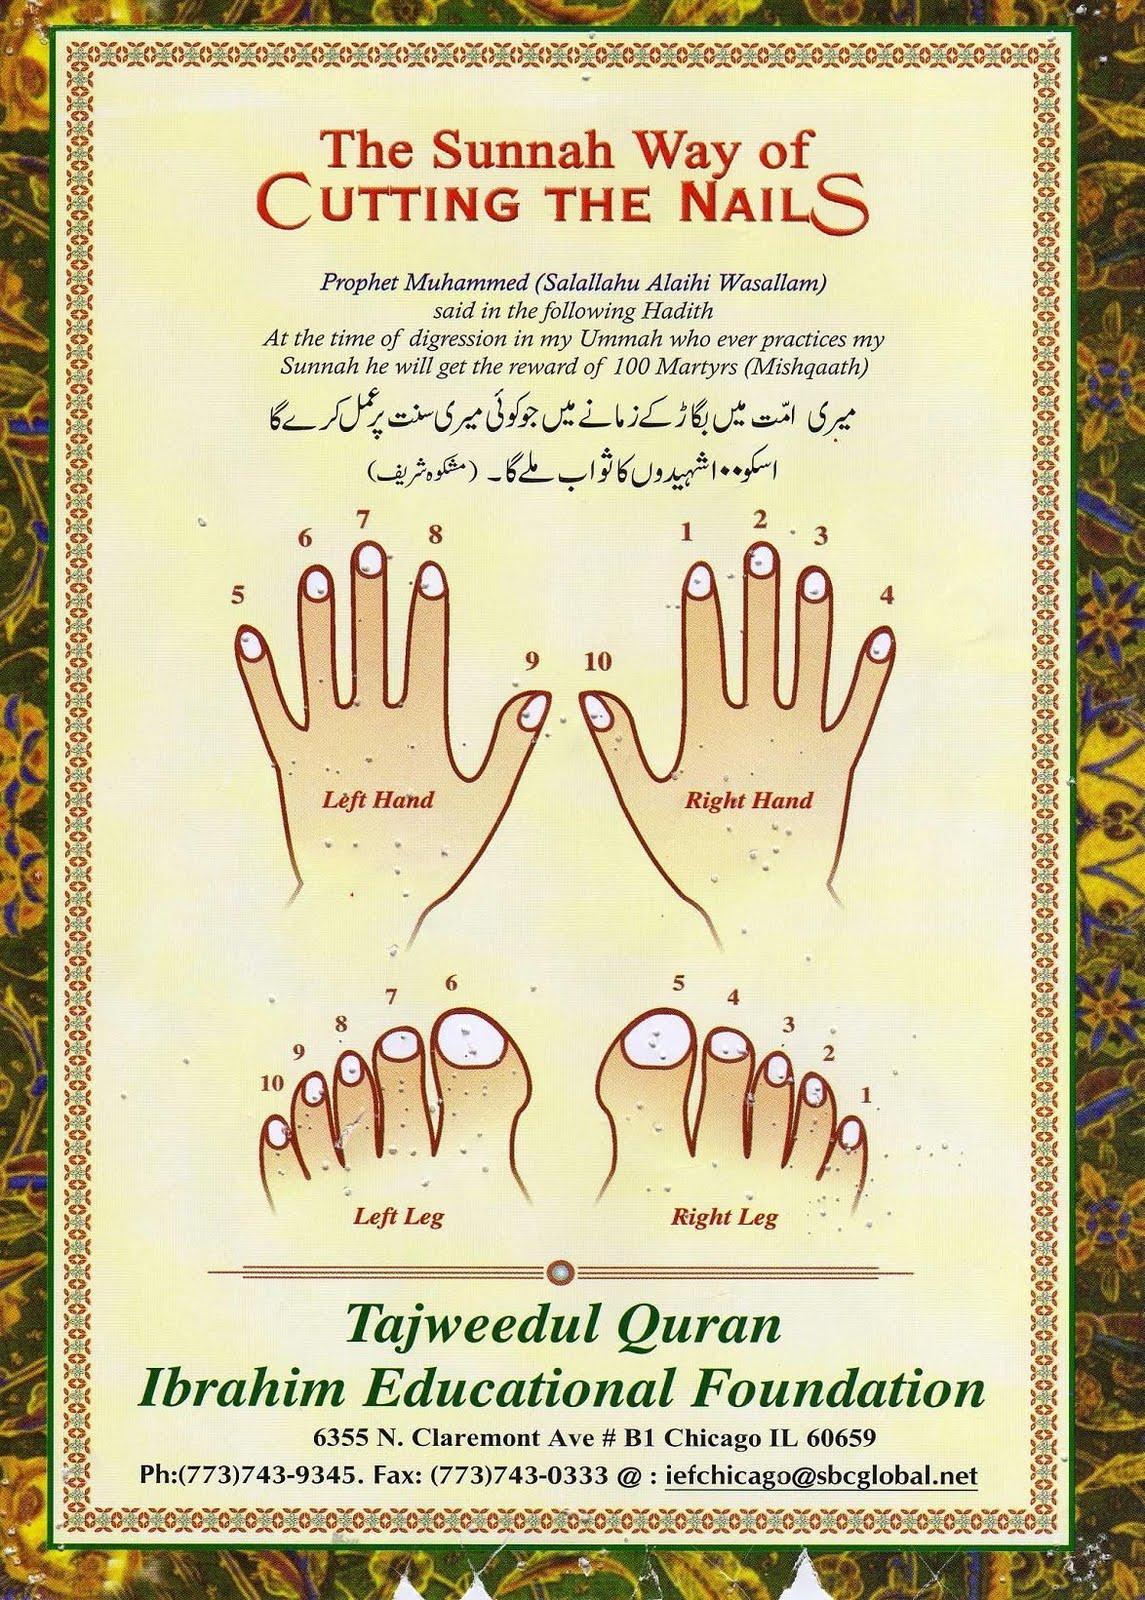 ISLAMIC BLOG: The Sunnah Way of Cutting the Nails